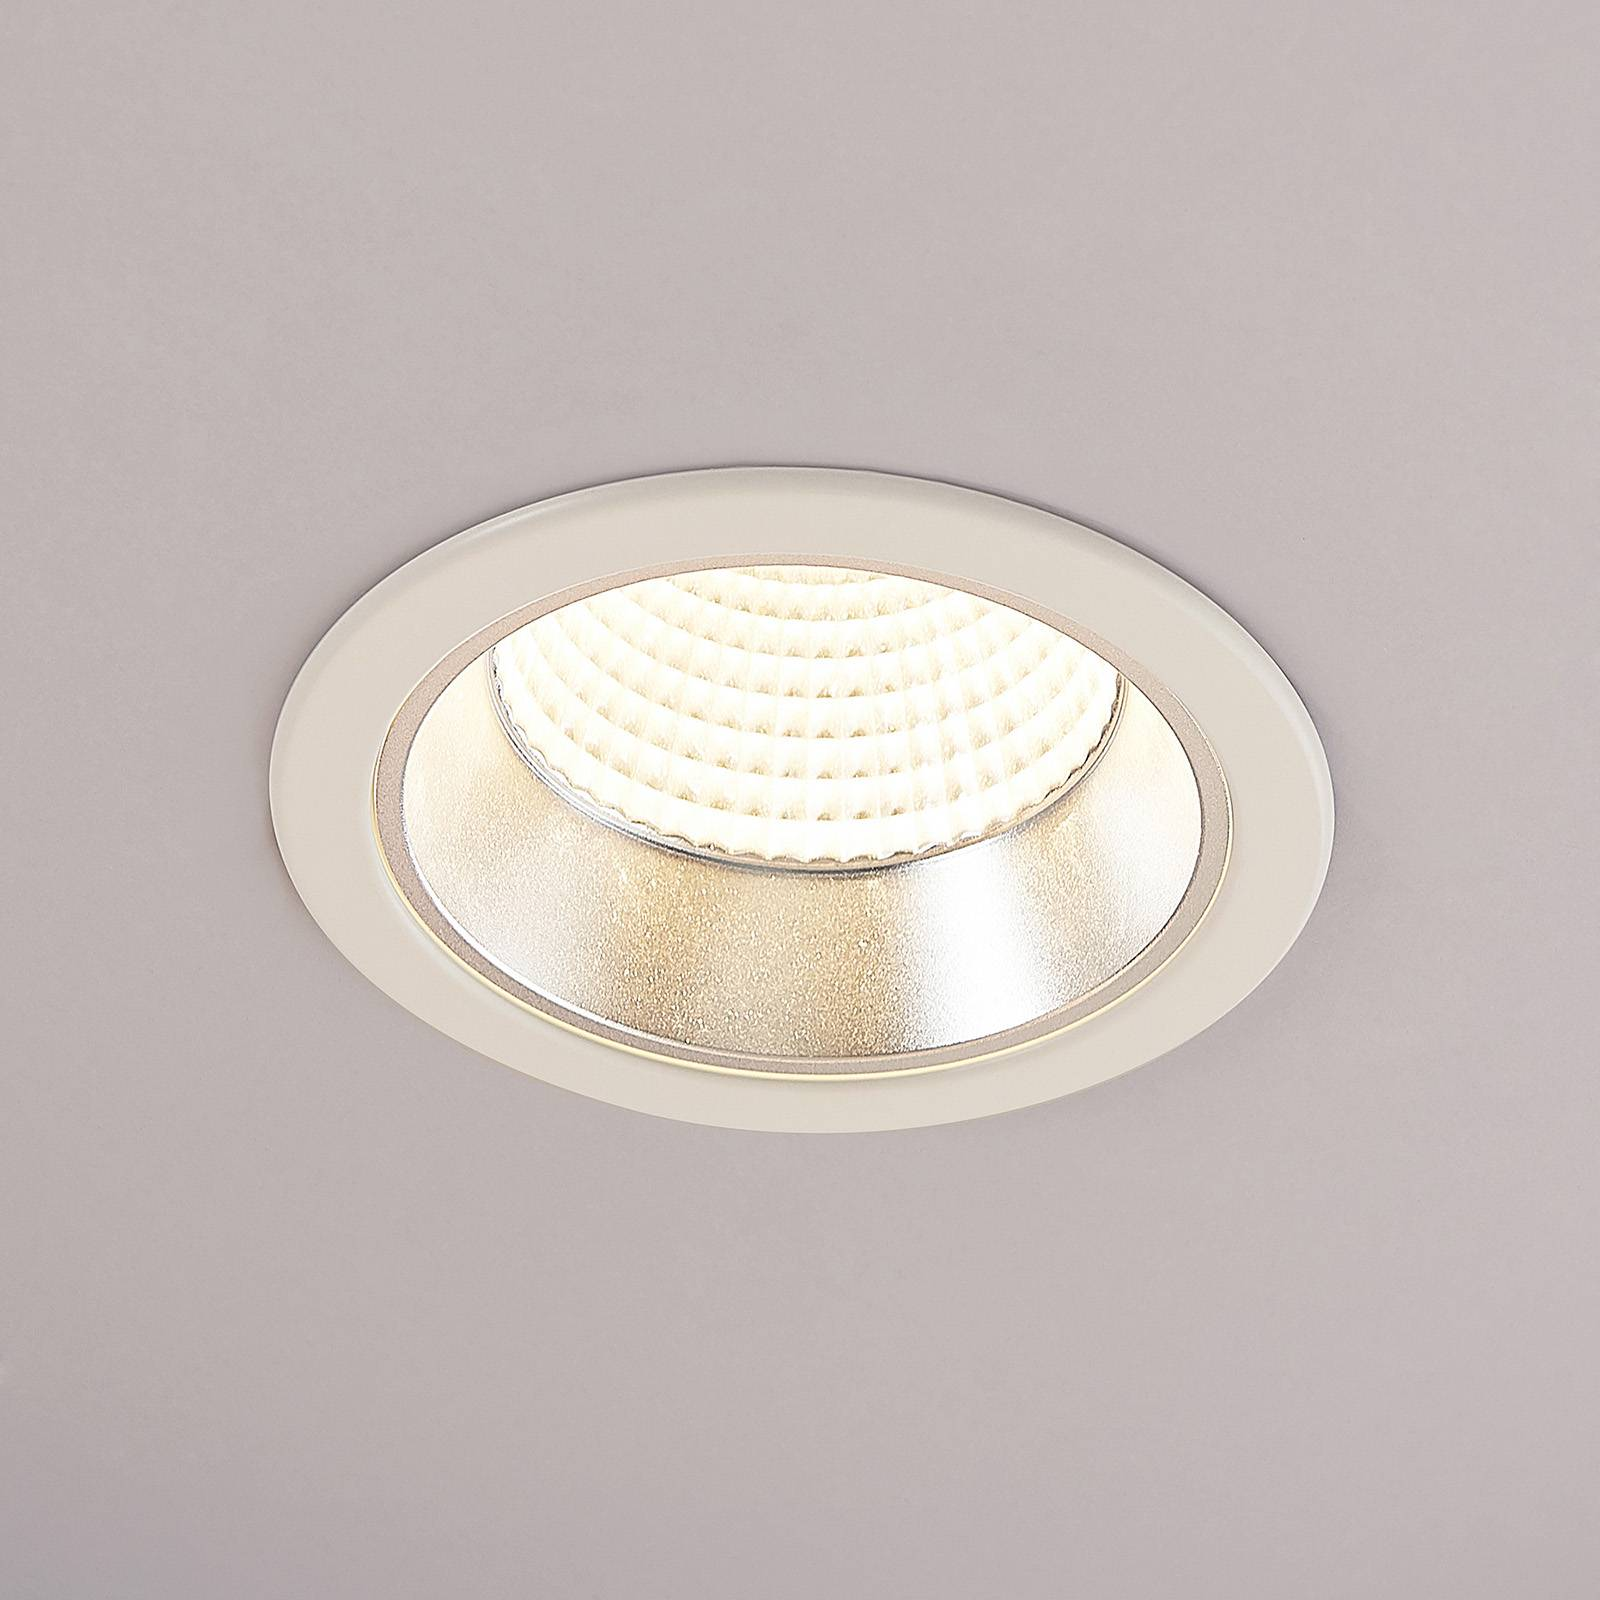 Arcchio Delano LED-kohdevalaisin, Ø 14,5 cm